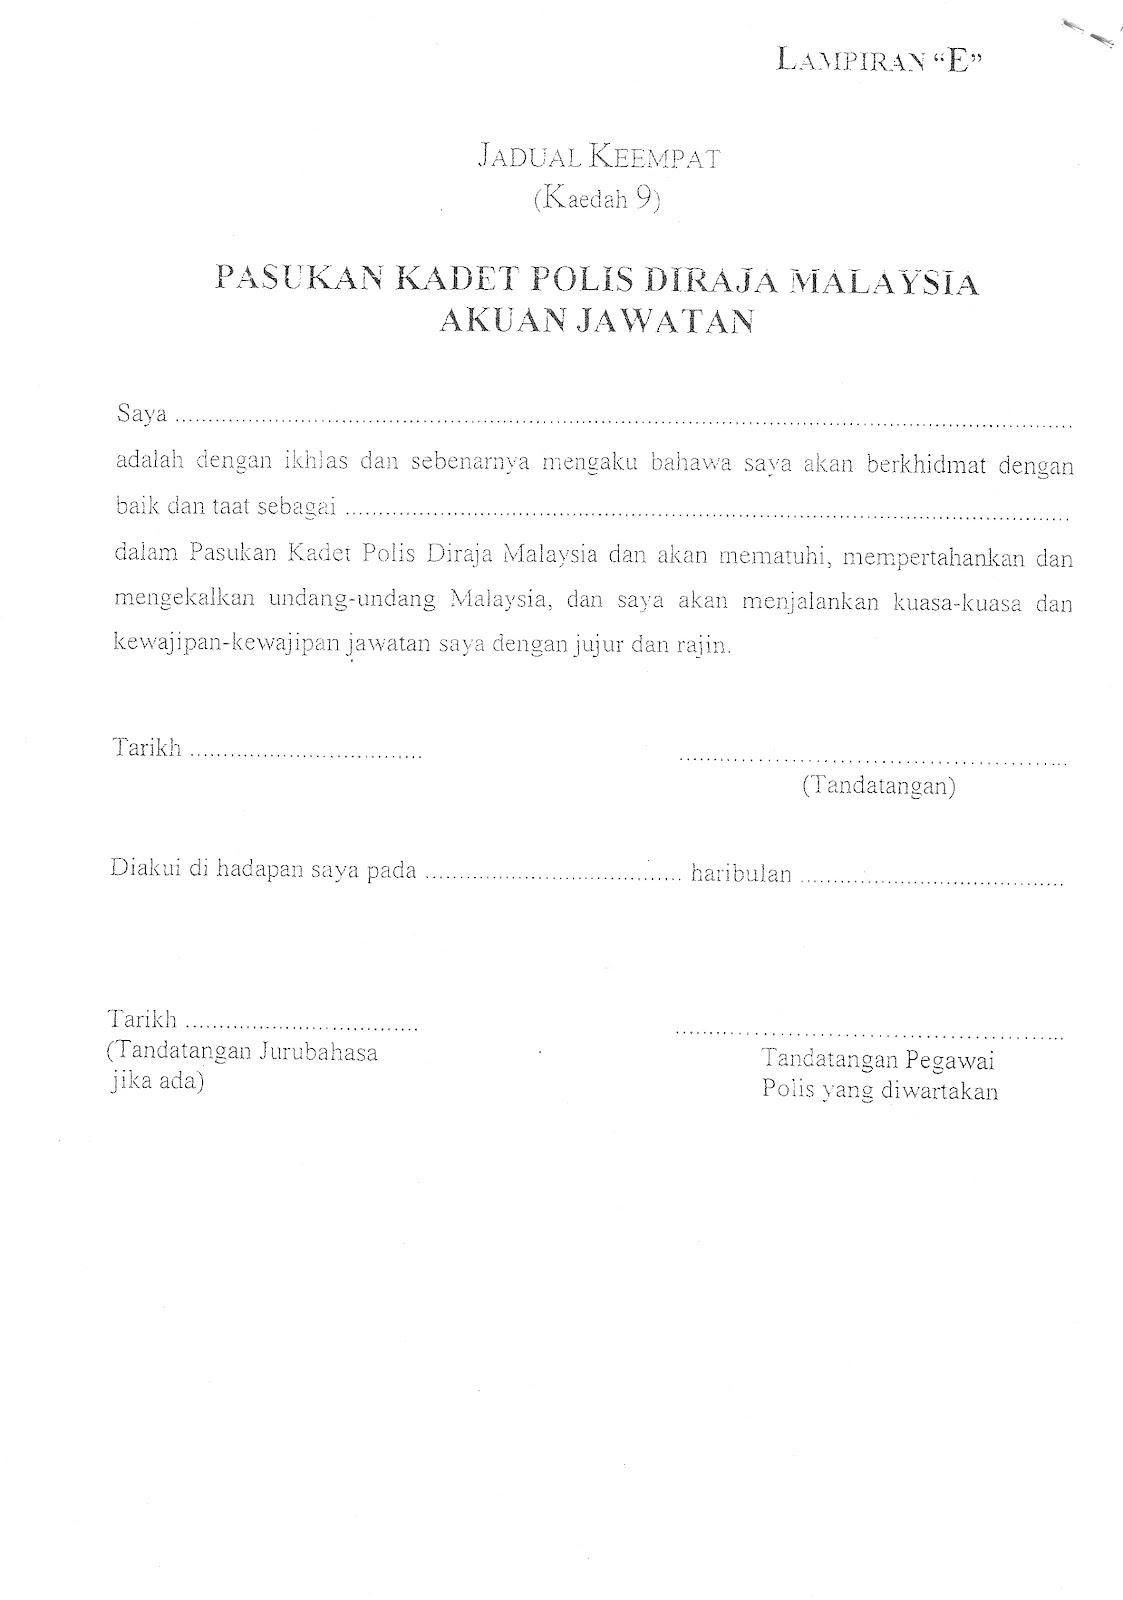 Kor Kadet Polis Smk Telok Gadong Februari 2012